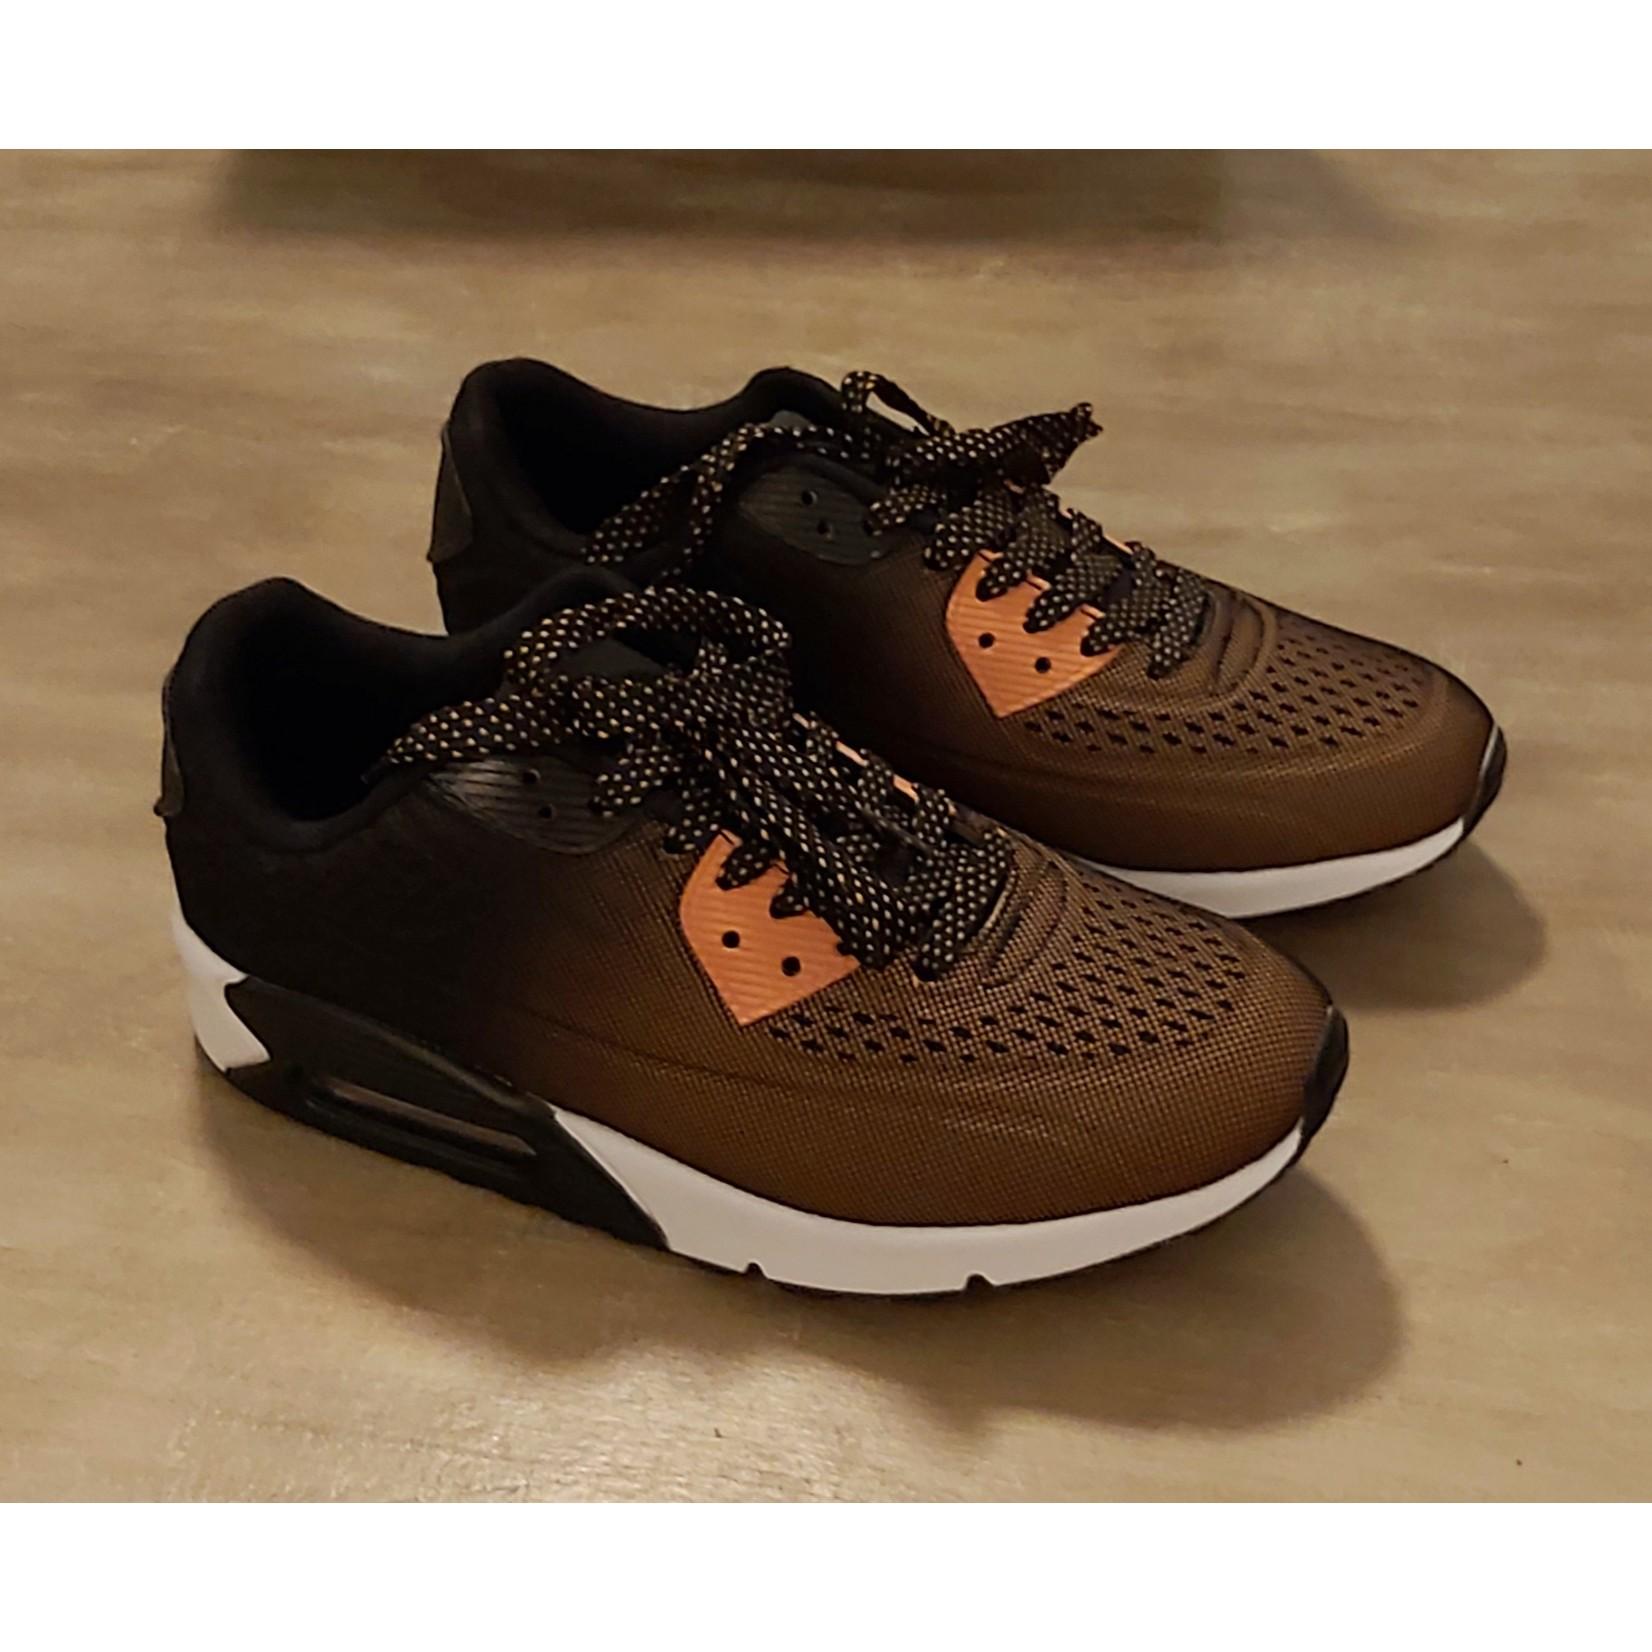 Sportieve sneaker unisex Bruin/Zwart